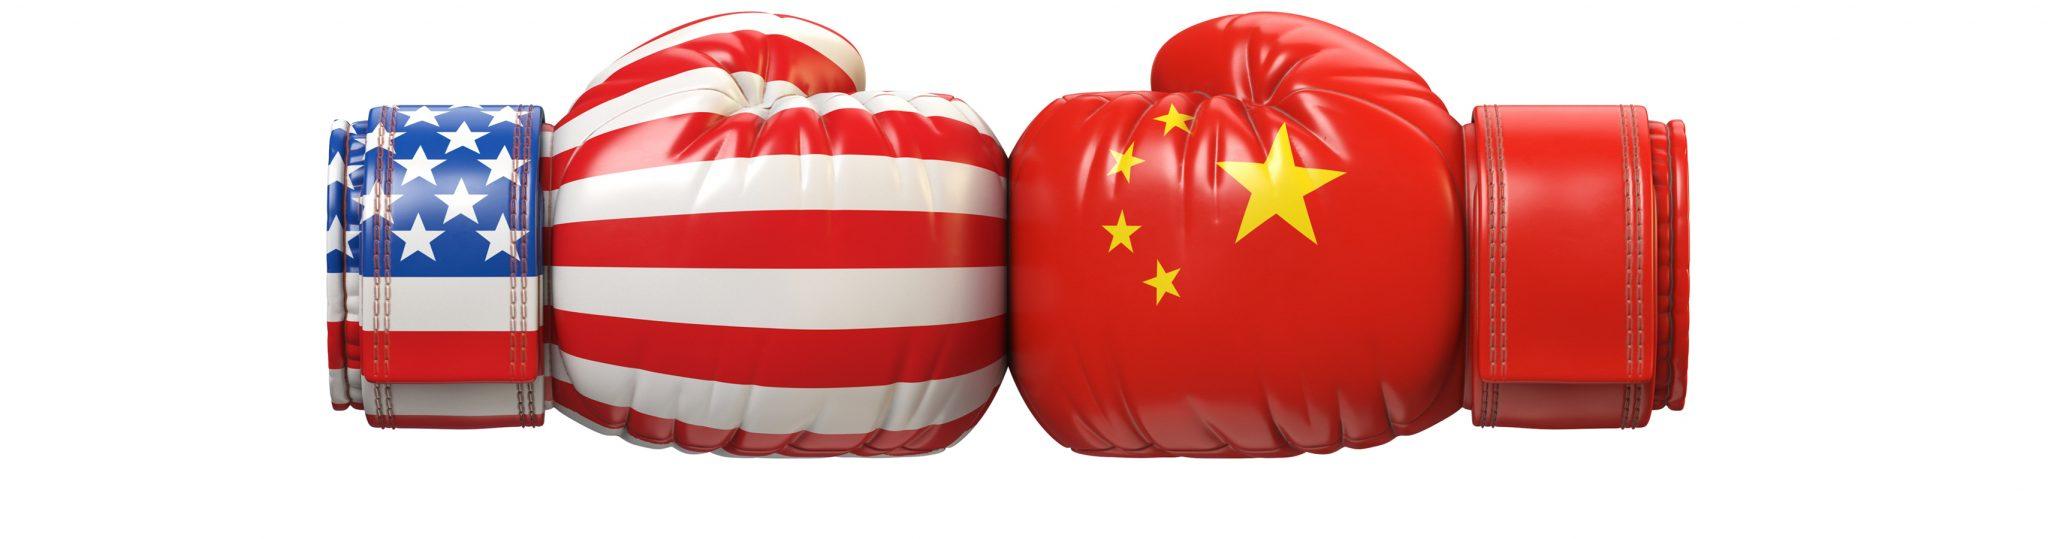 США vs Huawei: кто кого?